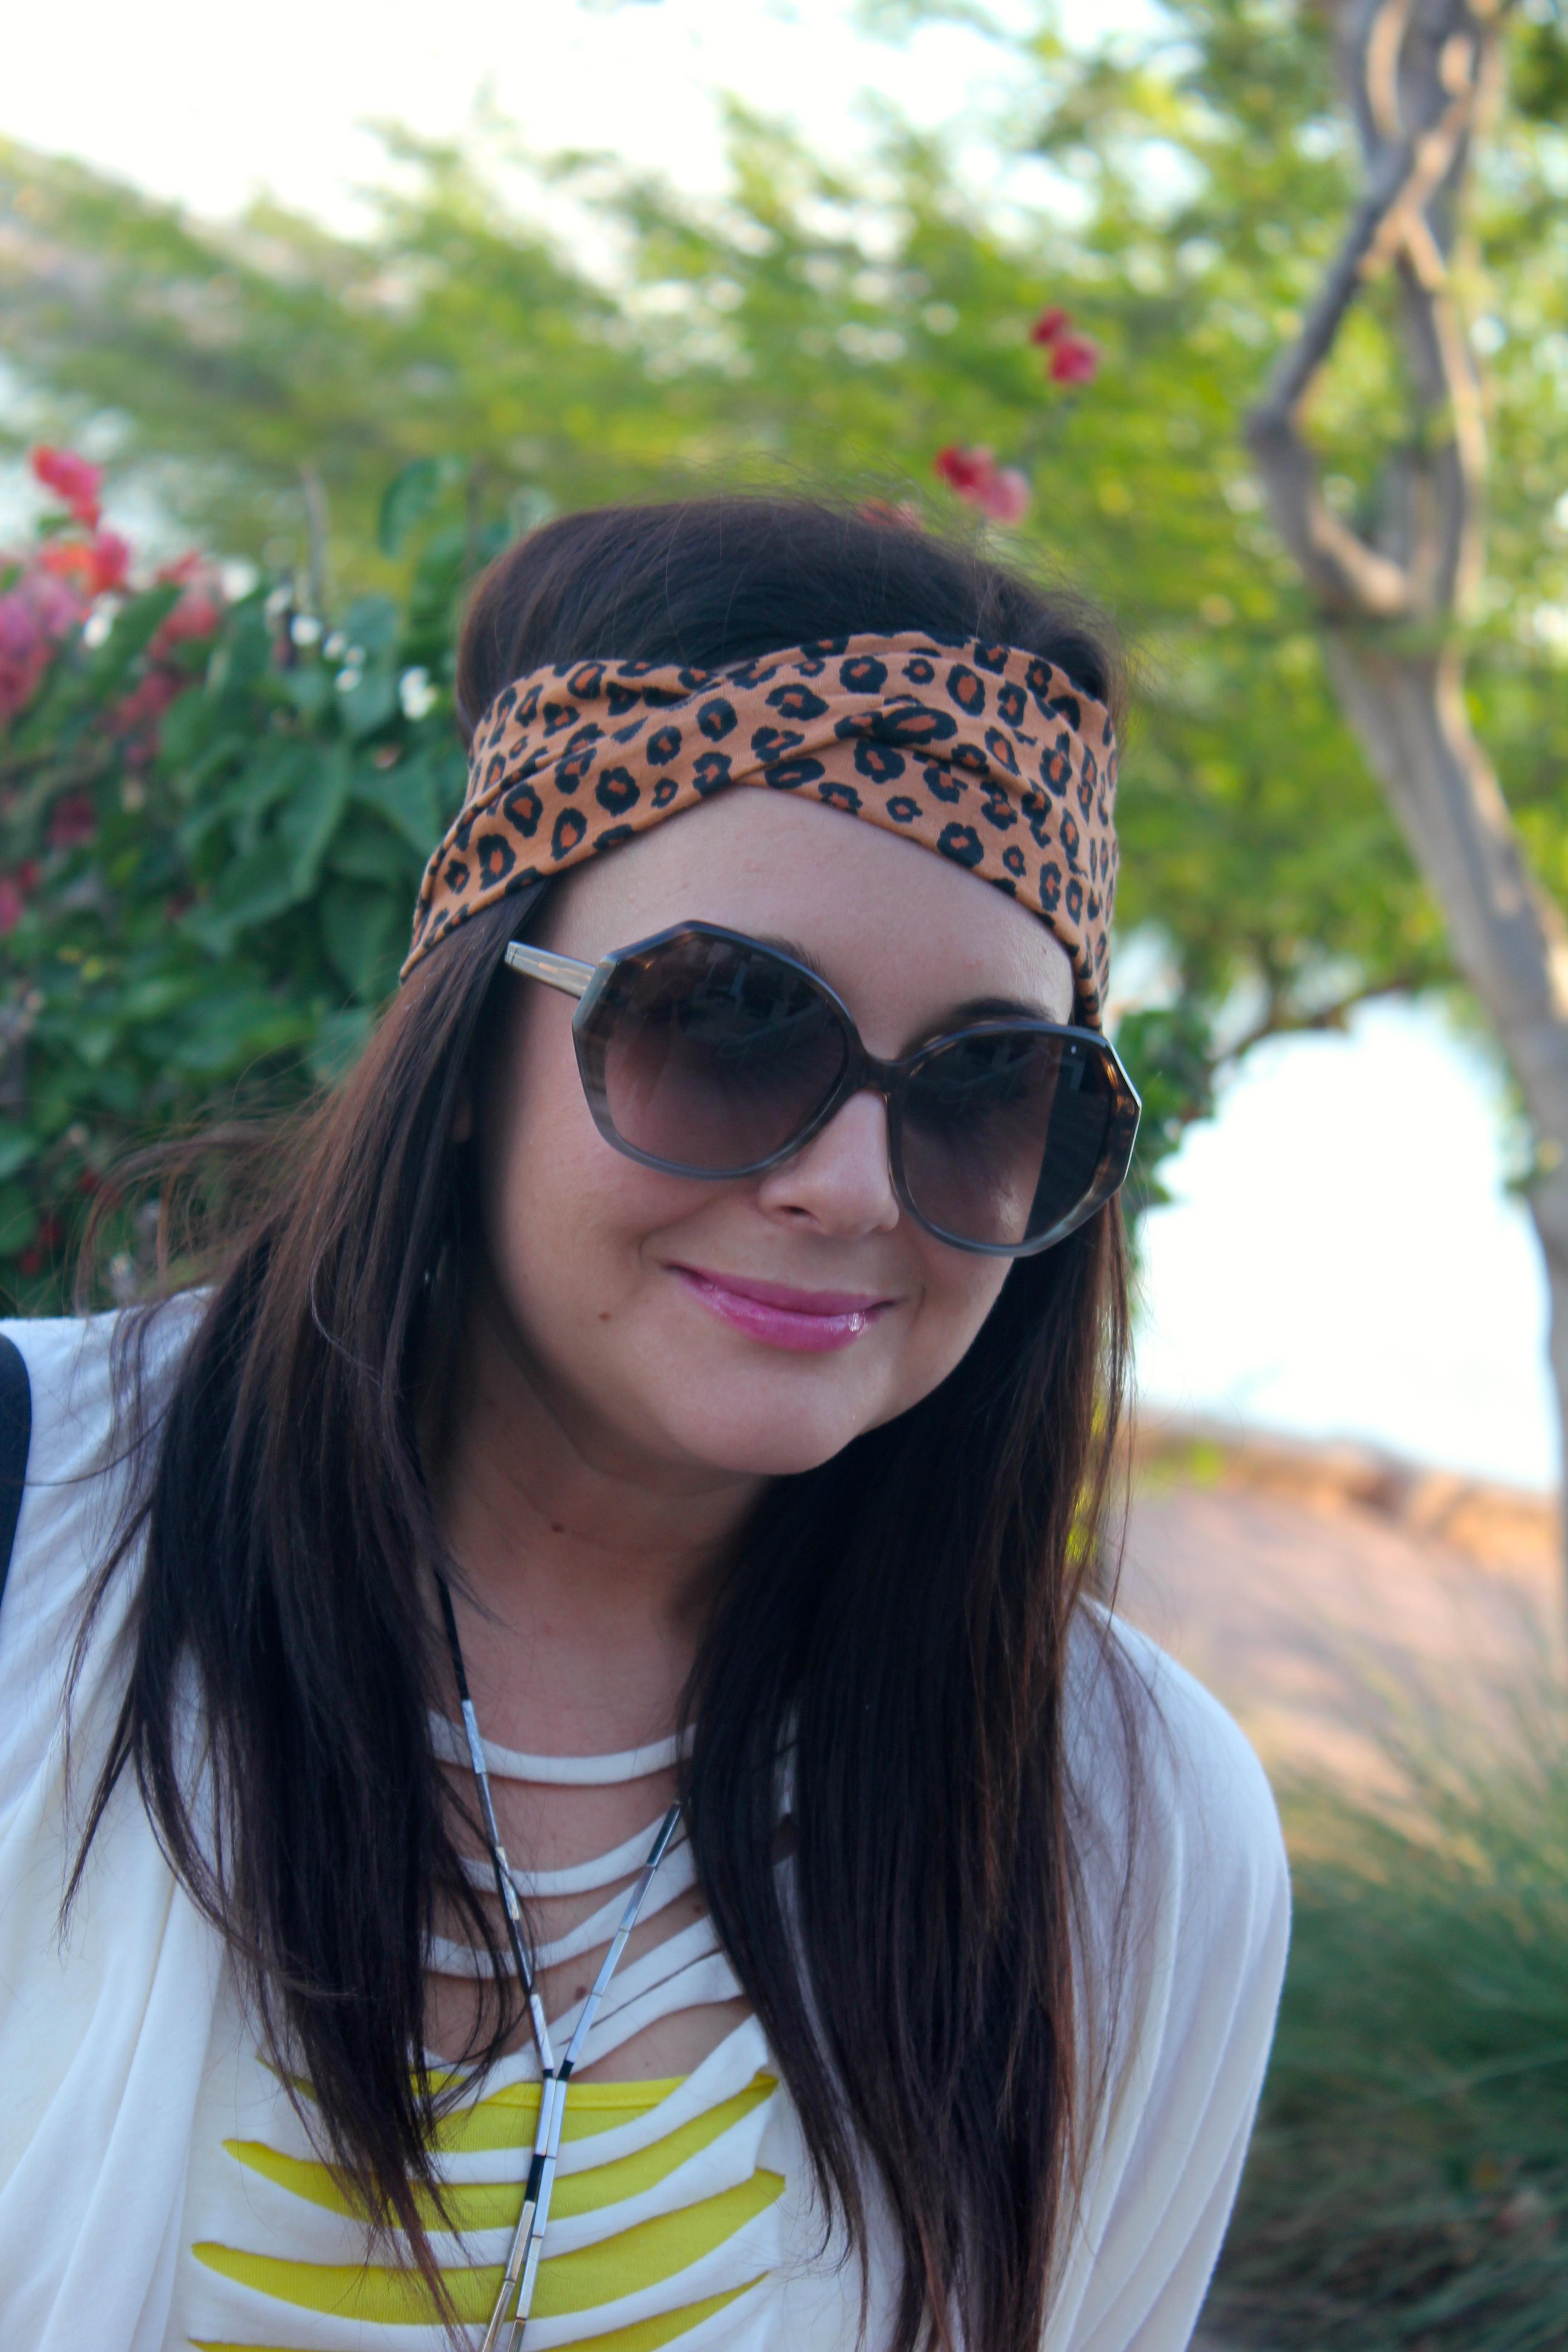 the pink ruffle headband